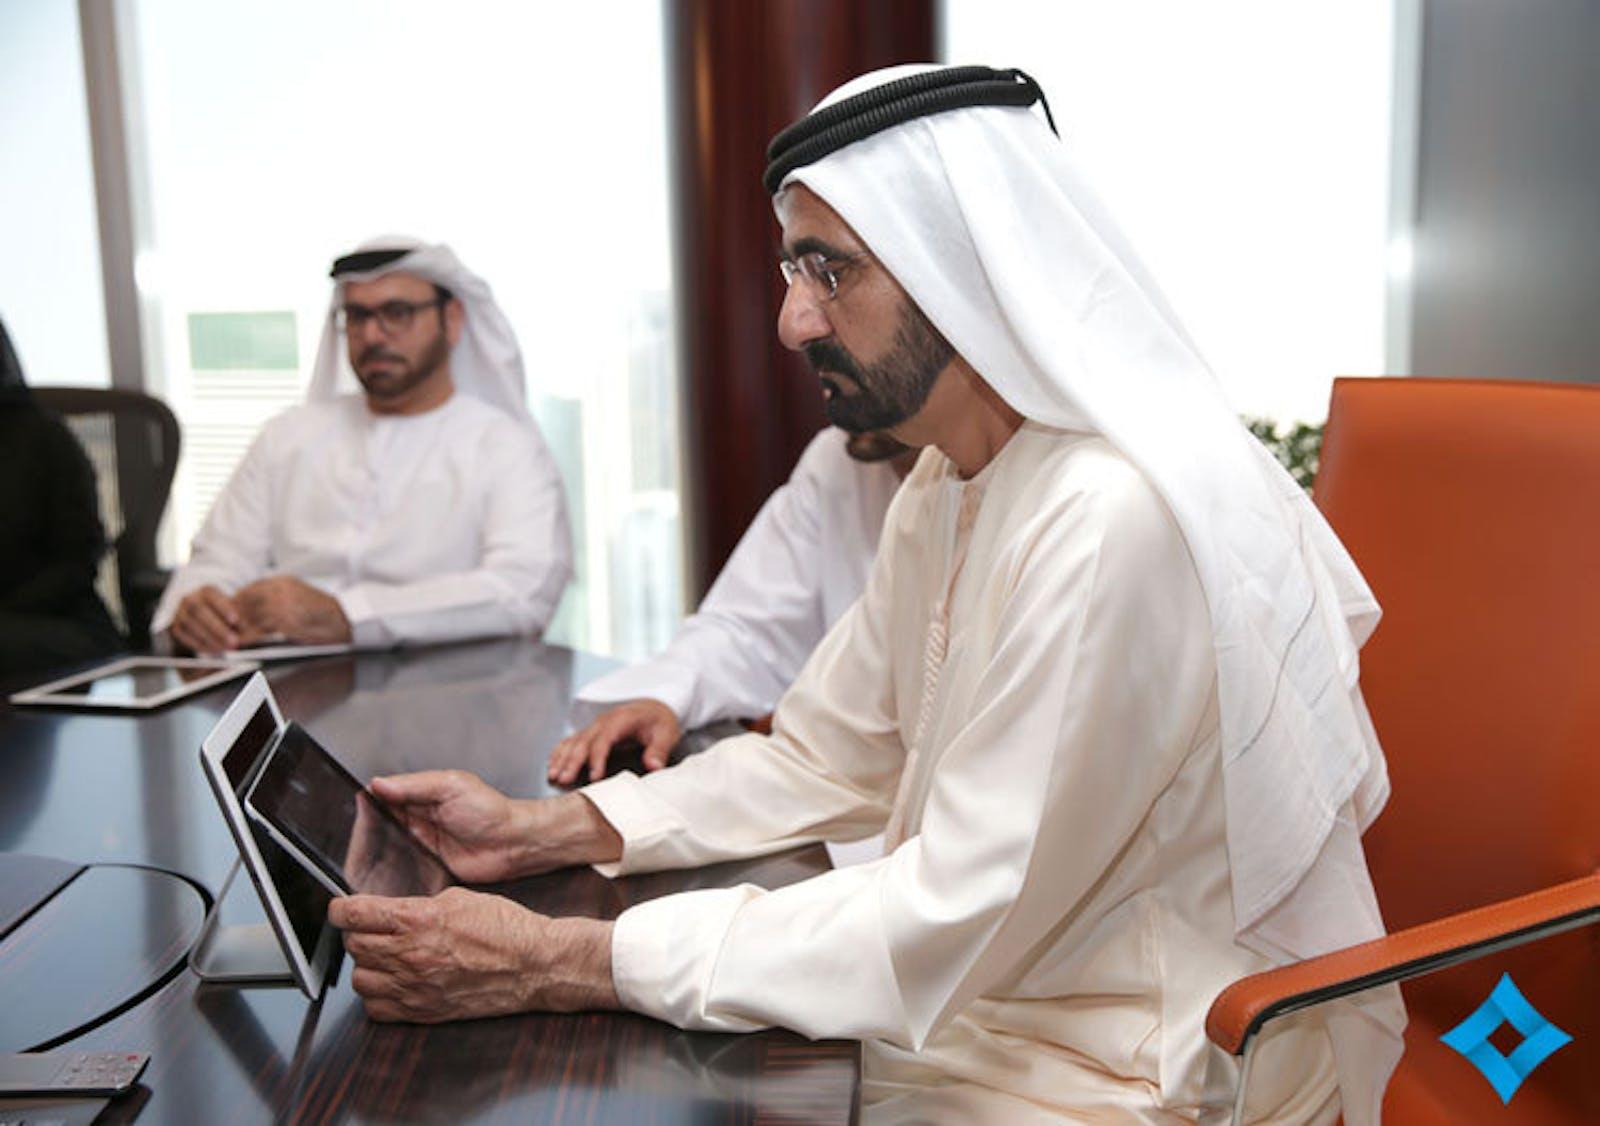 Sheikh Mohammed uses B·U·T's iPad app